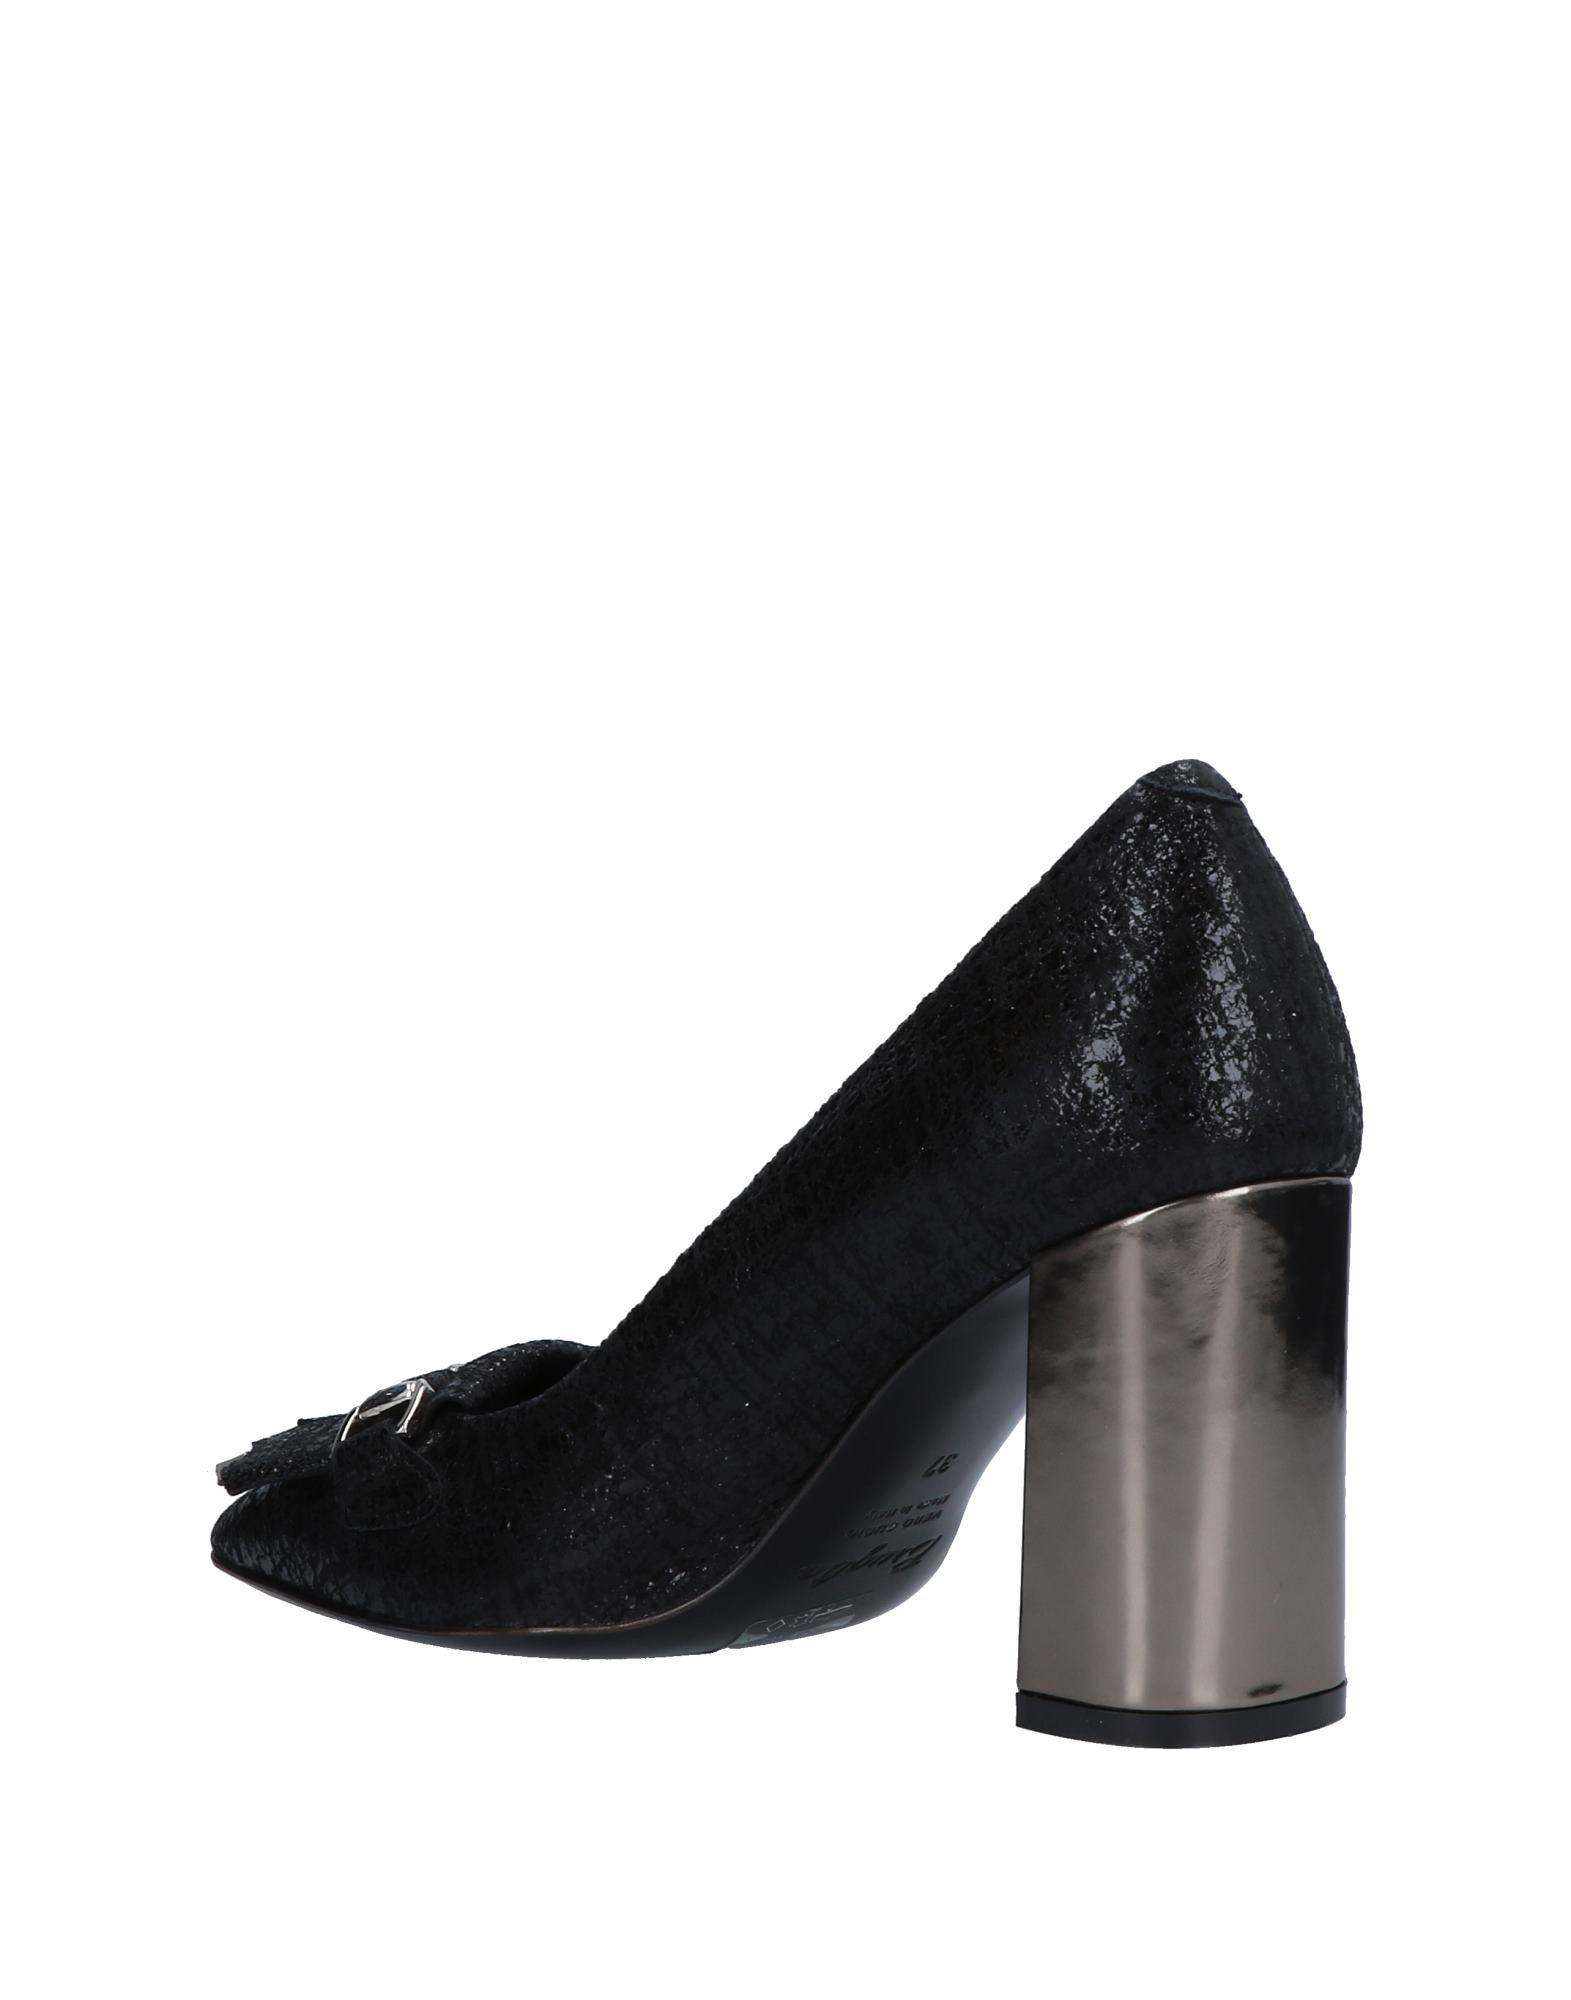 Stilvolle Mokassins billige Schuhe F.Lli Bruglia Mokassins Stilvolle Damen  11517665AE bcd586